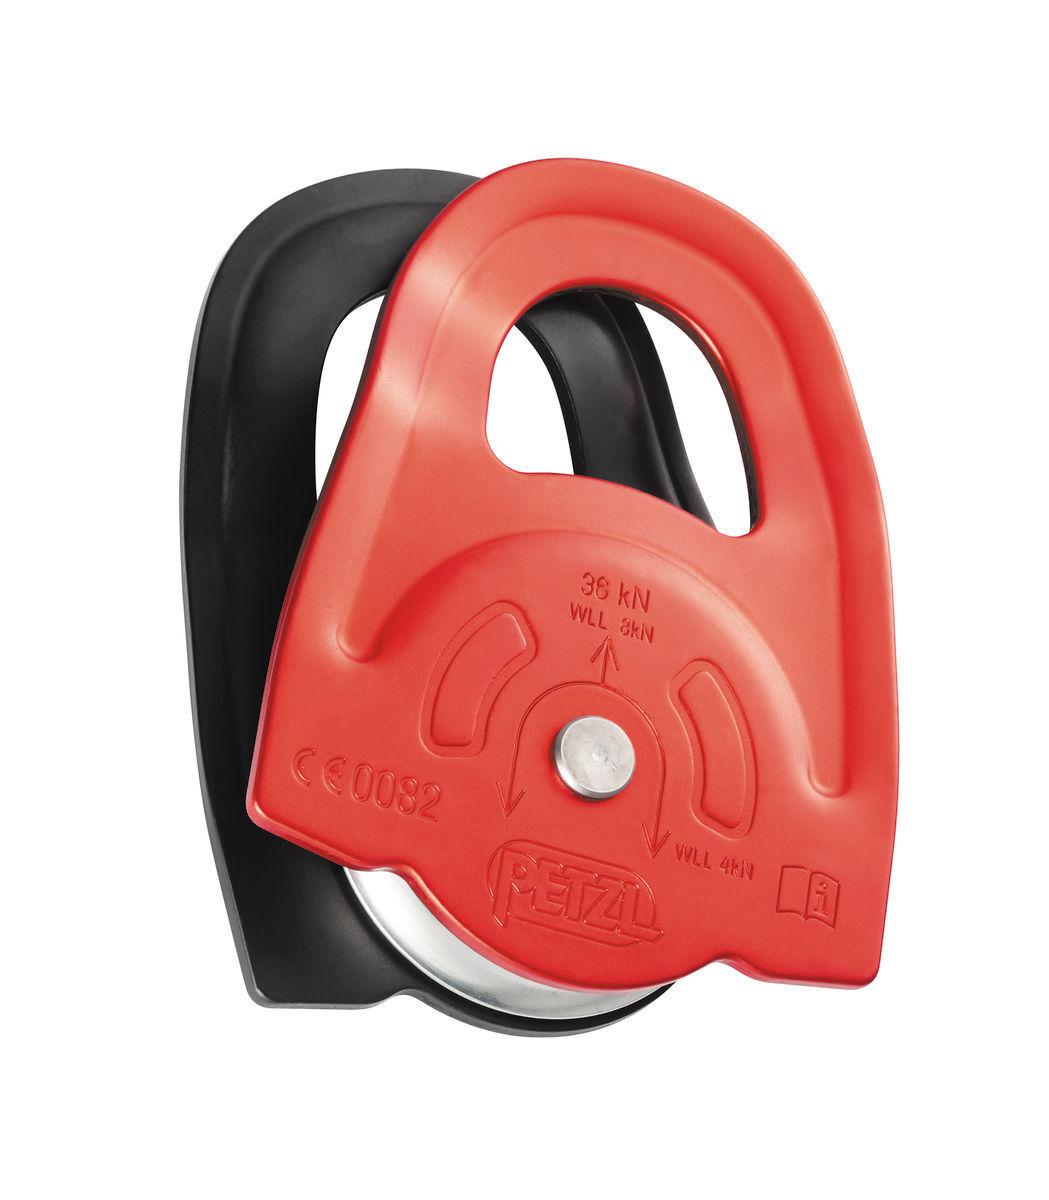 PETZL MINDER - High strength, very high efficiency Prusik pulley